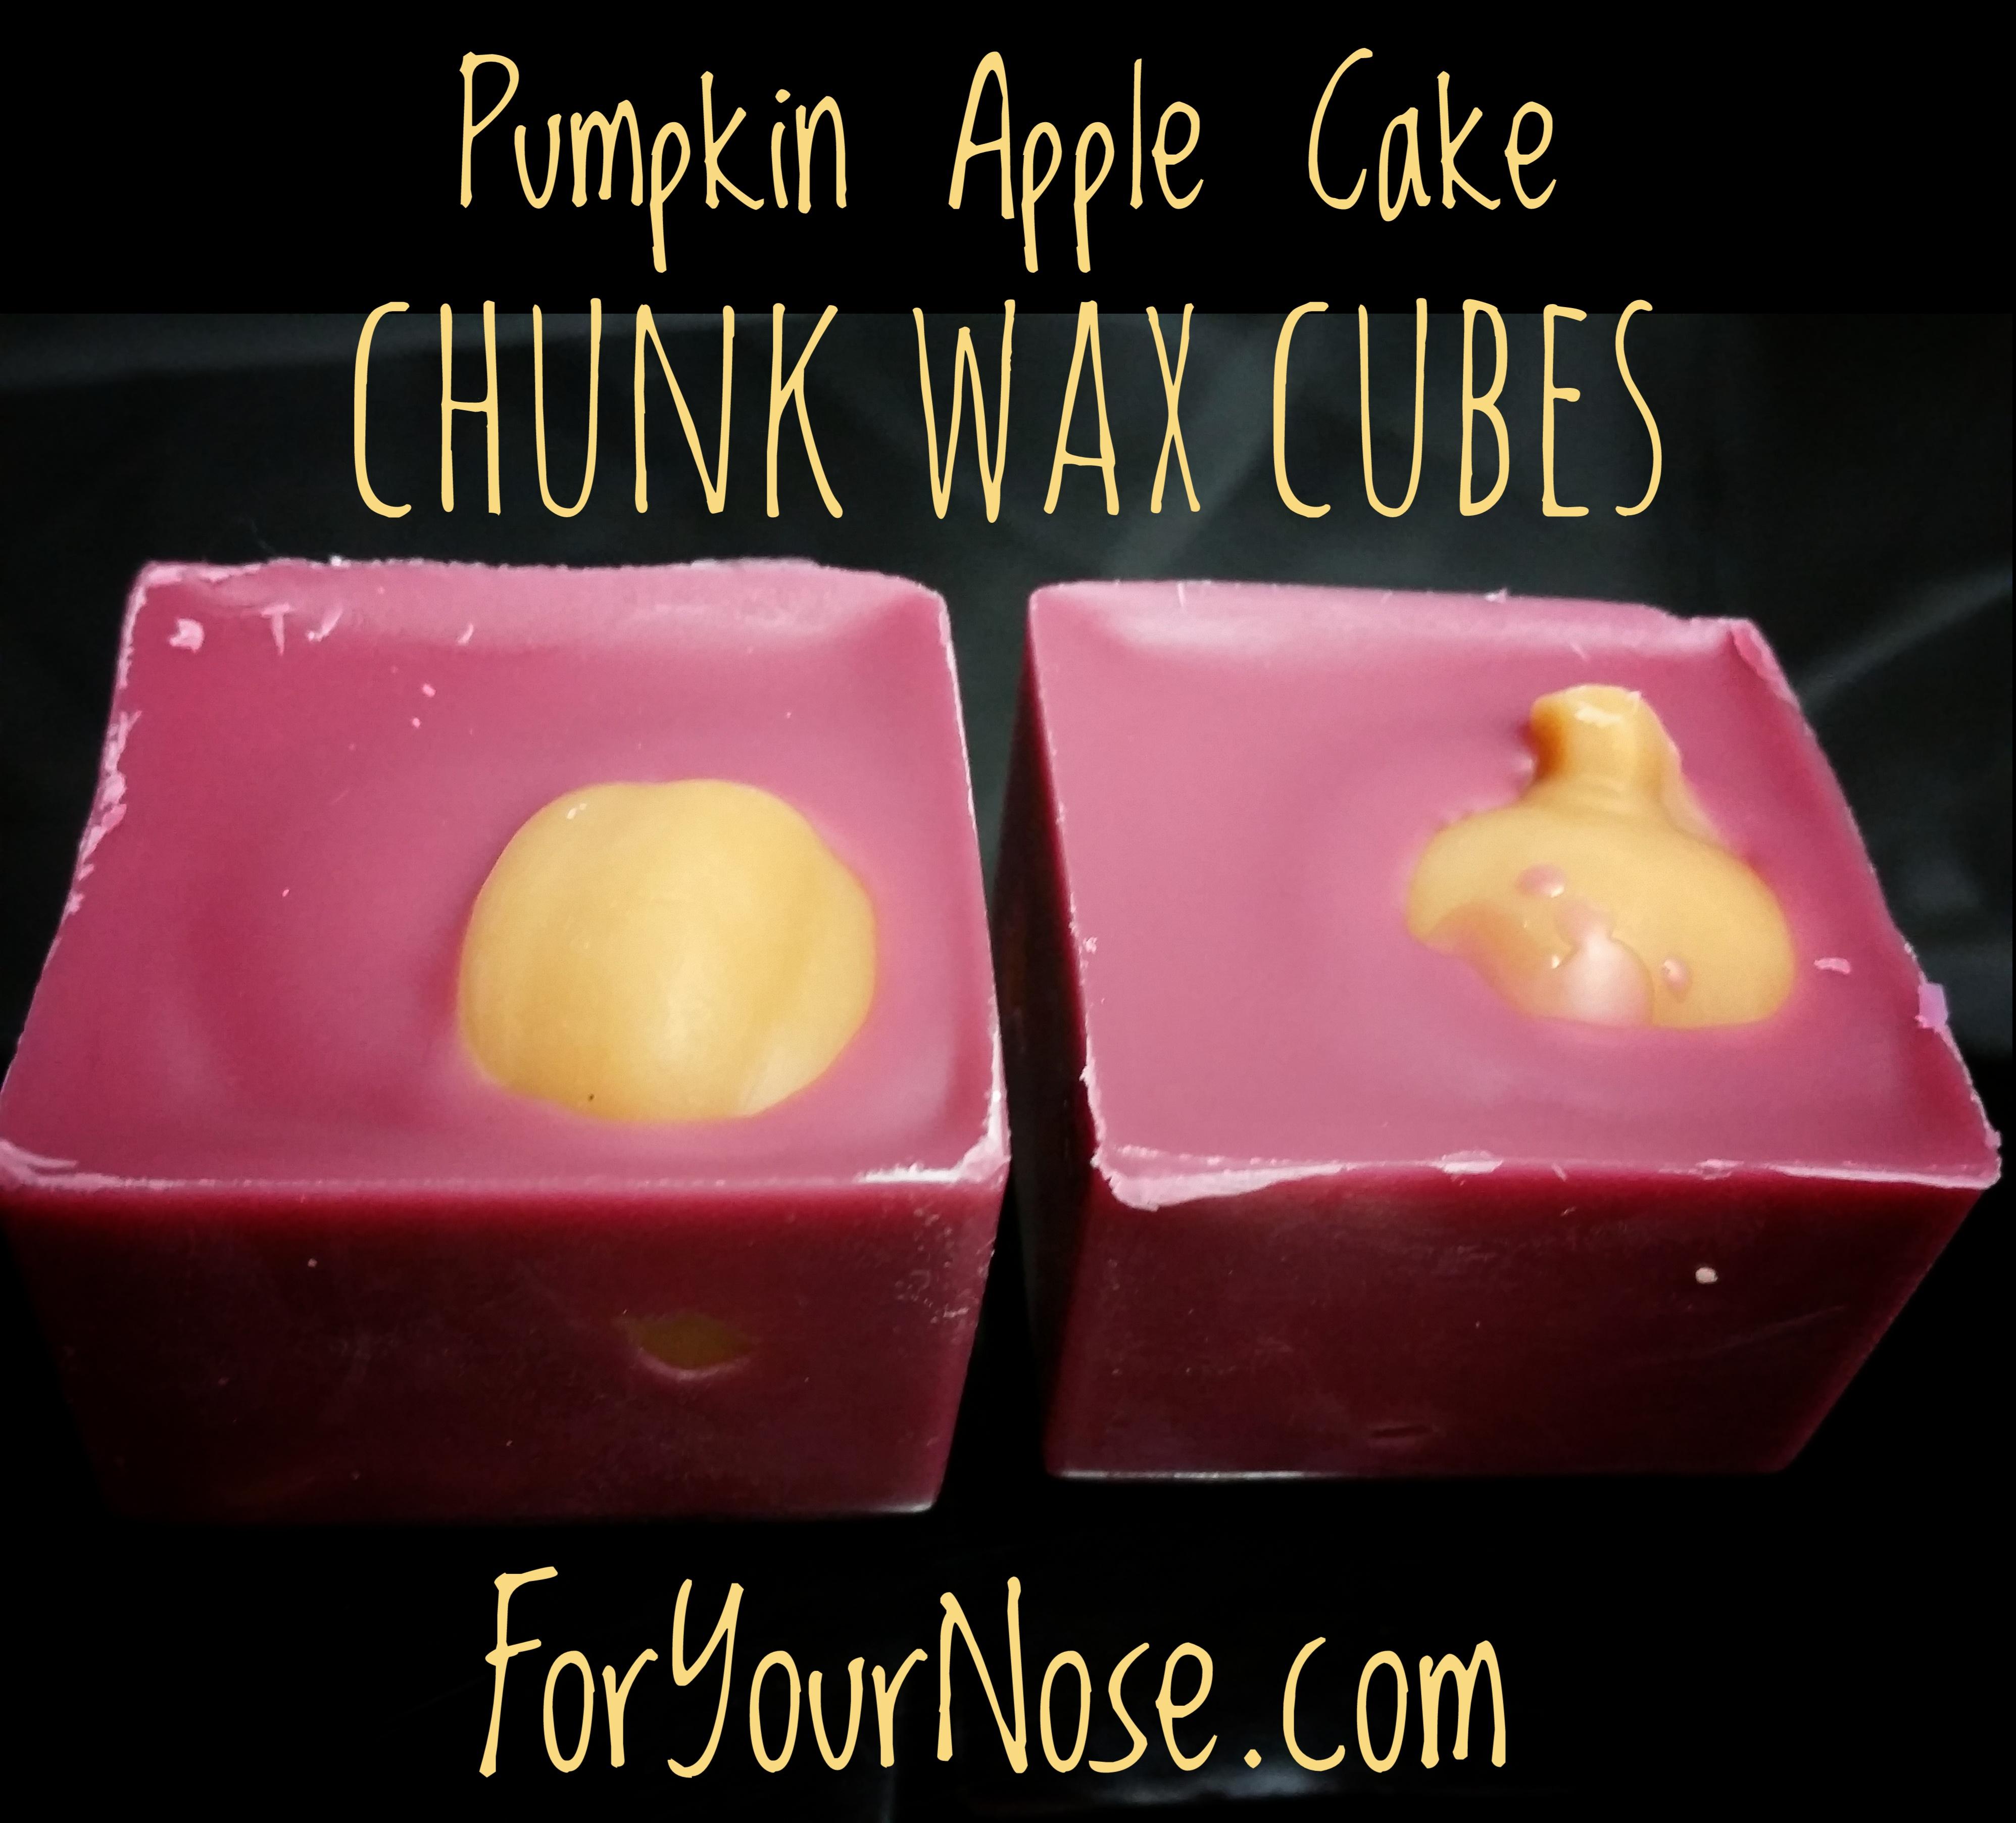 Pumpkin Apple Cake Chunk Wax Cubes